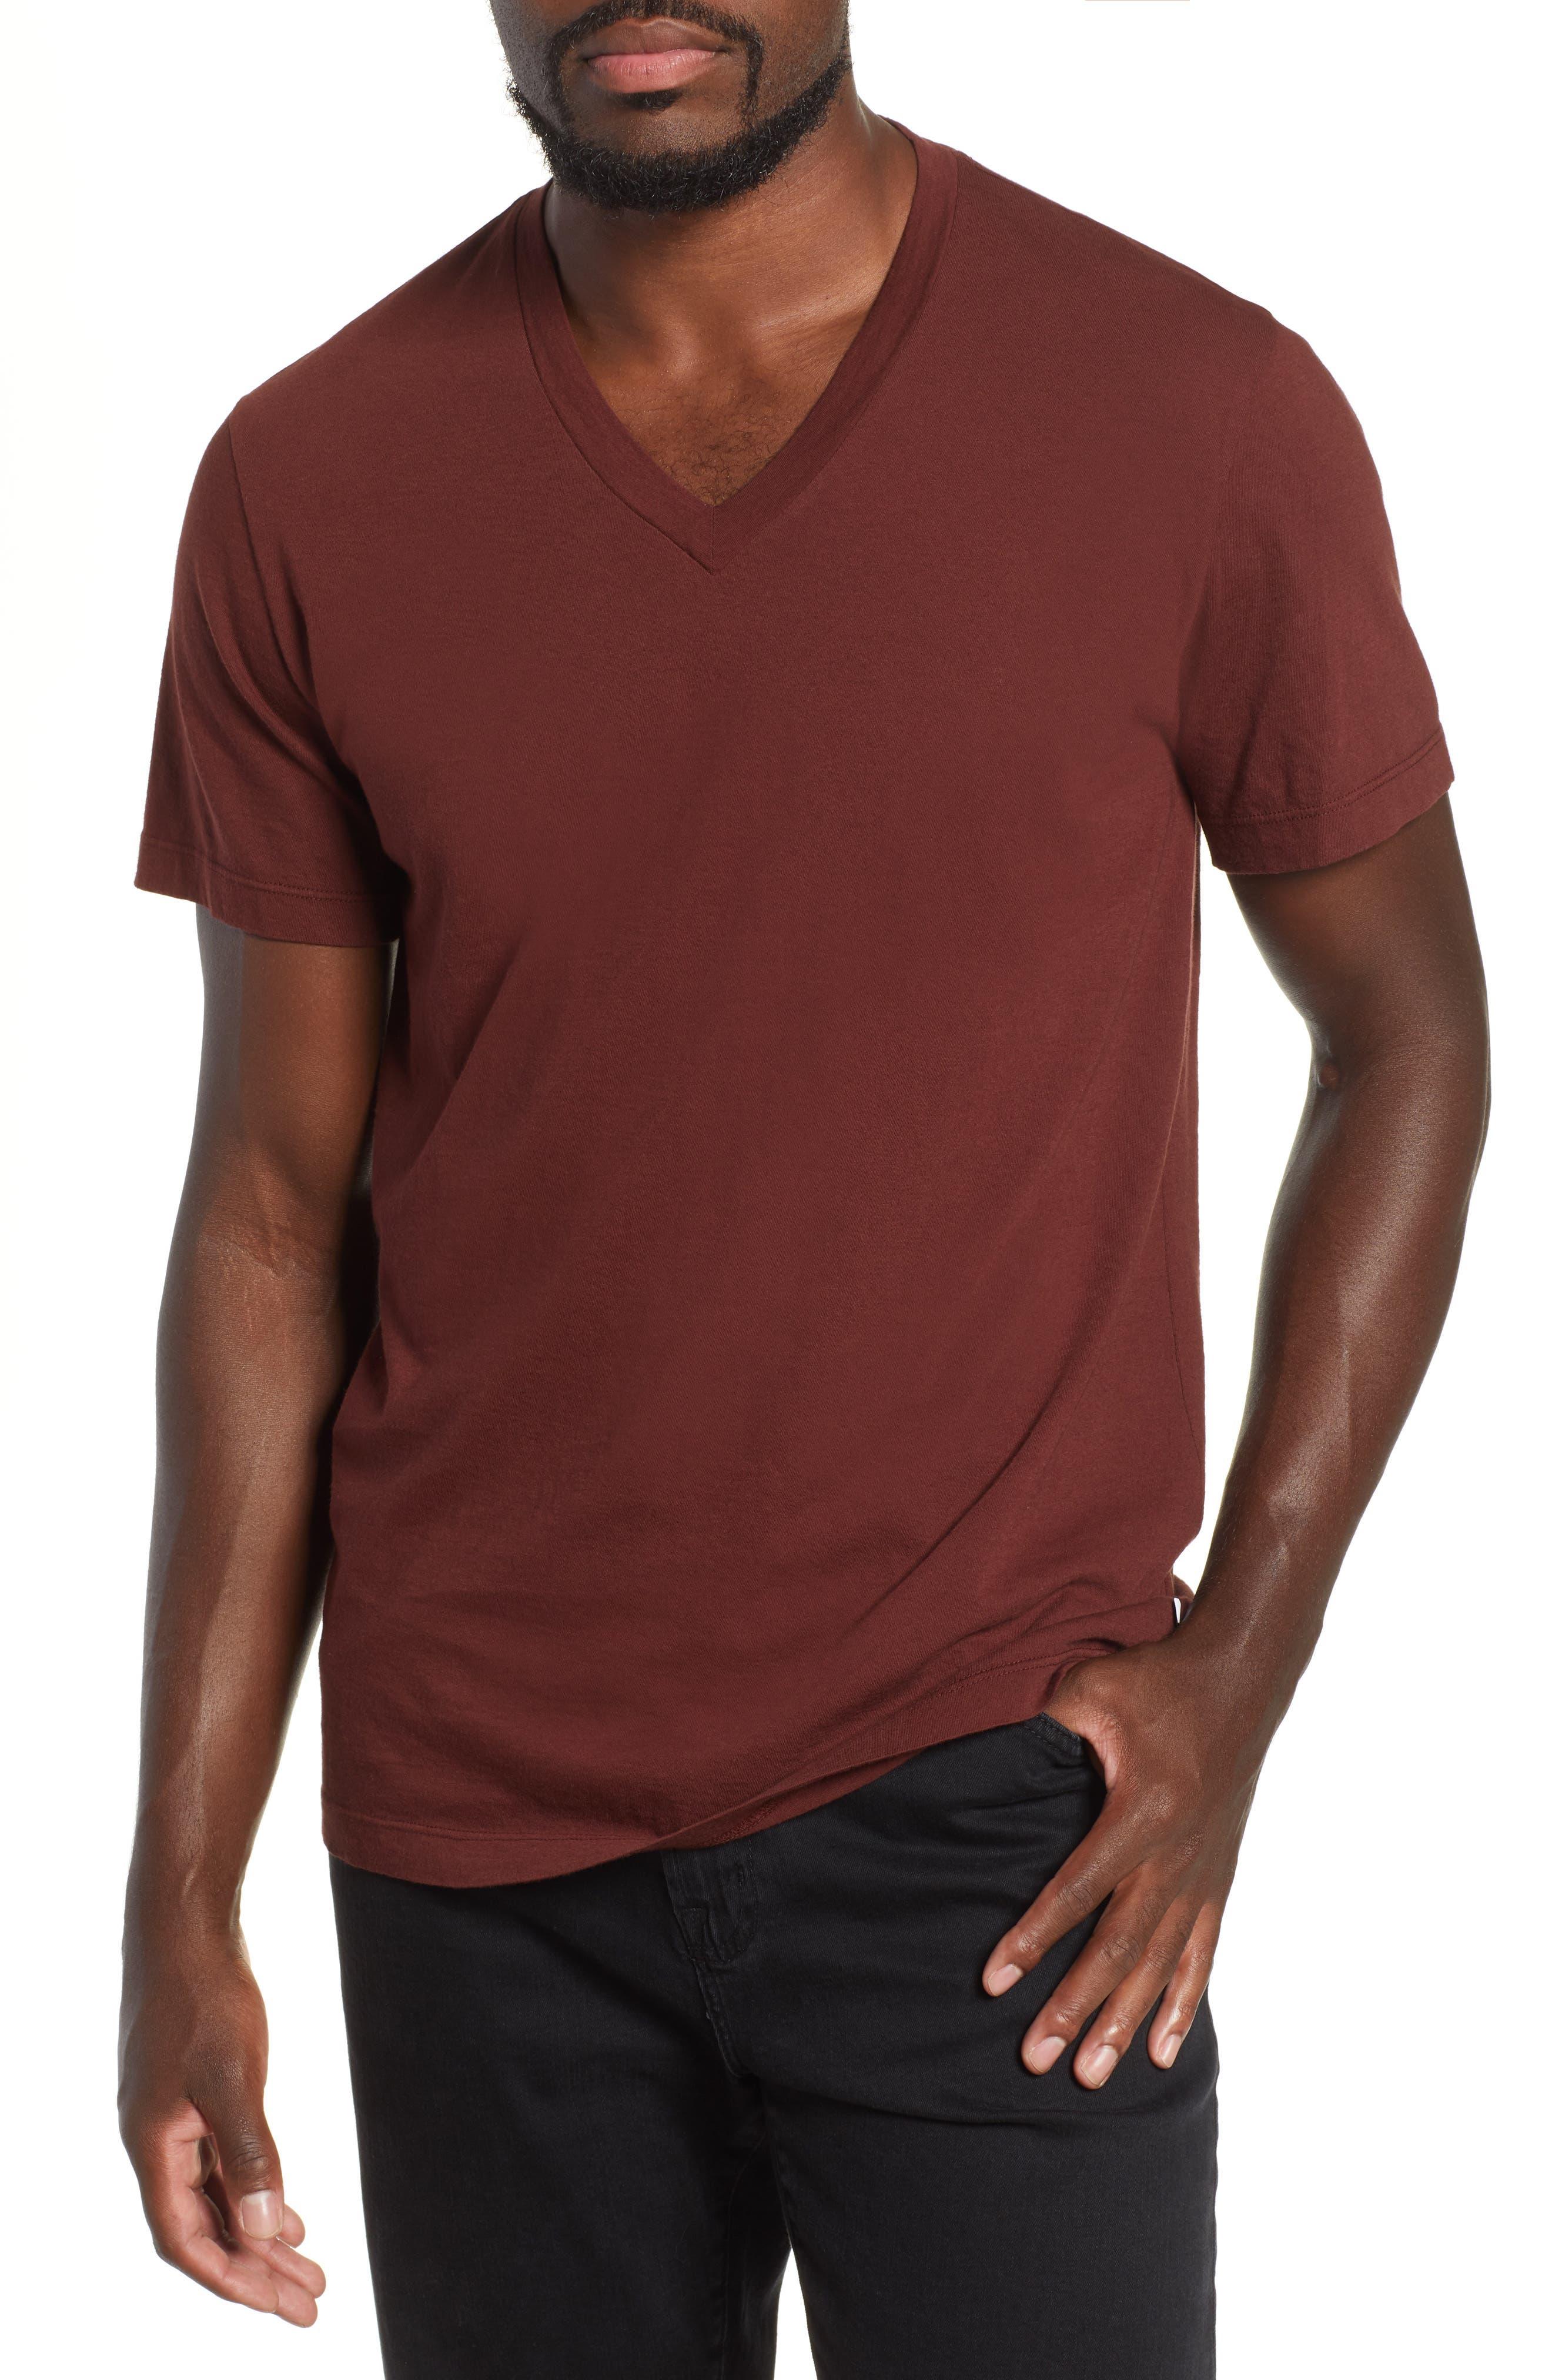 8624c157589 Nike Womens Dri Fit Shadow Stripe T Shirt – Rockwall Auction